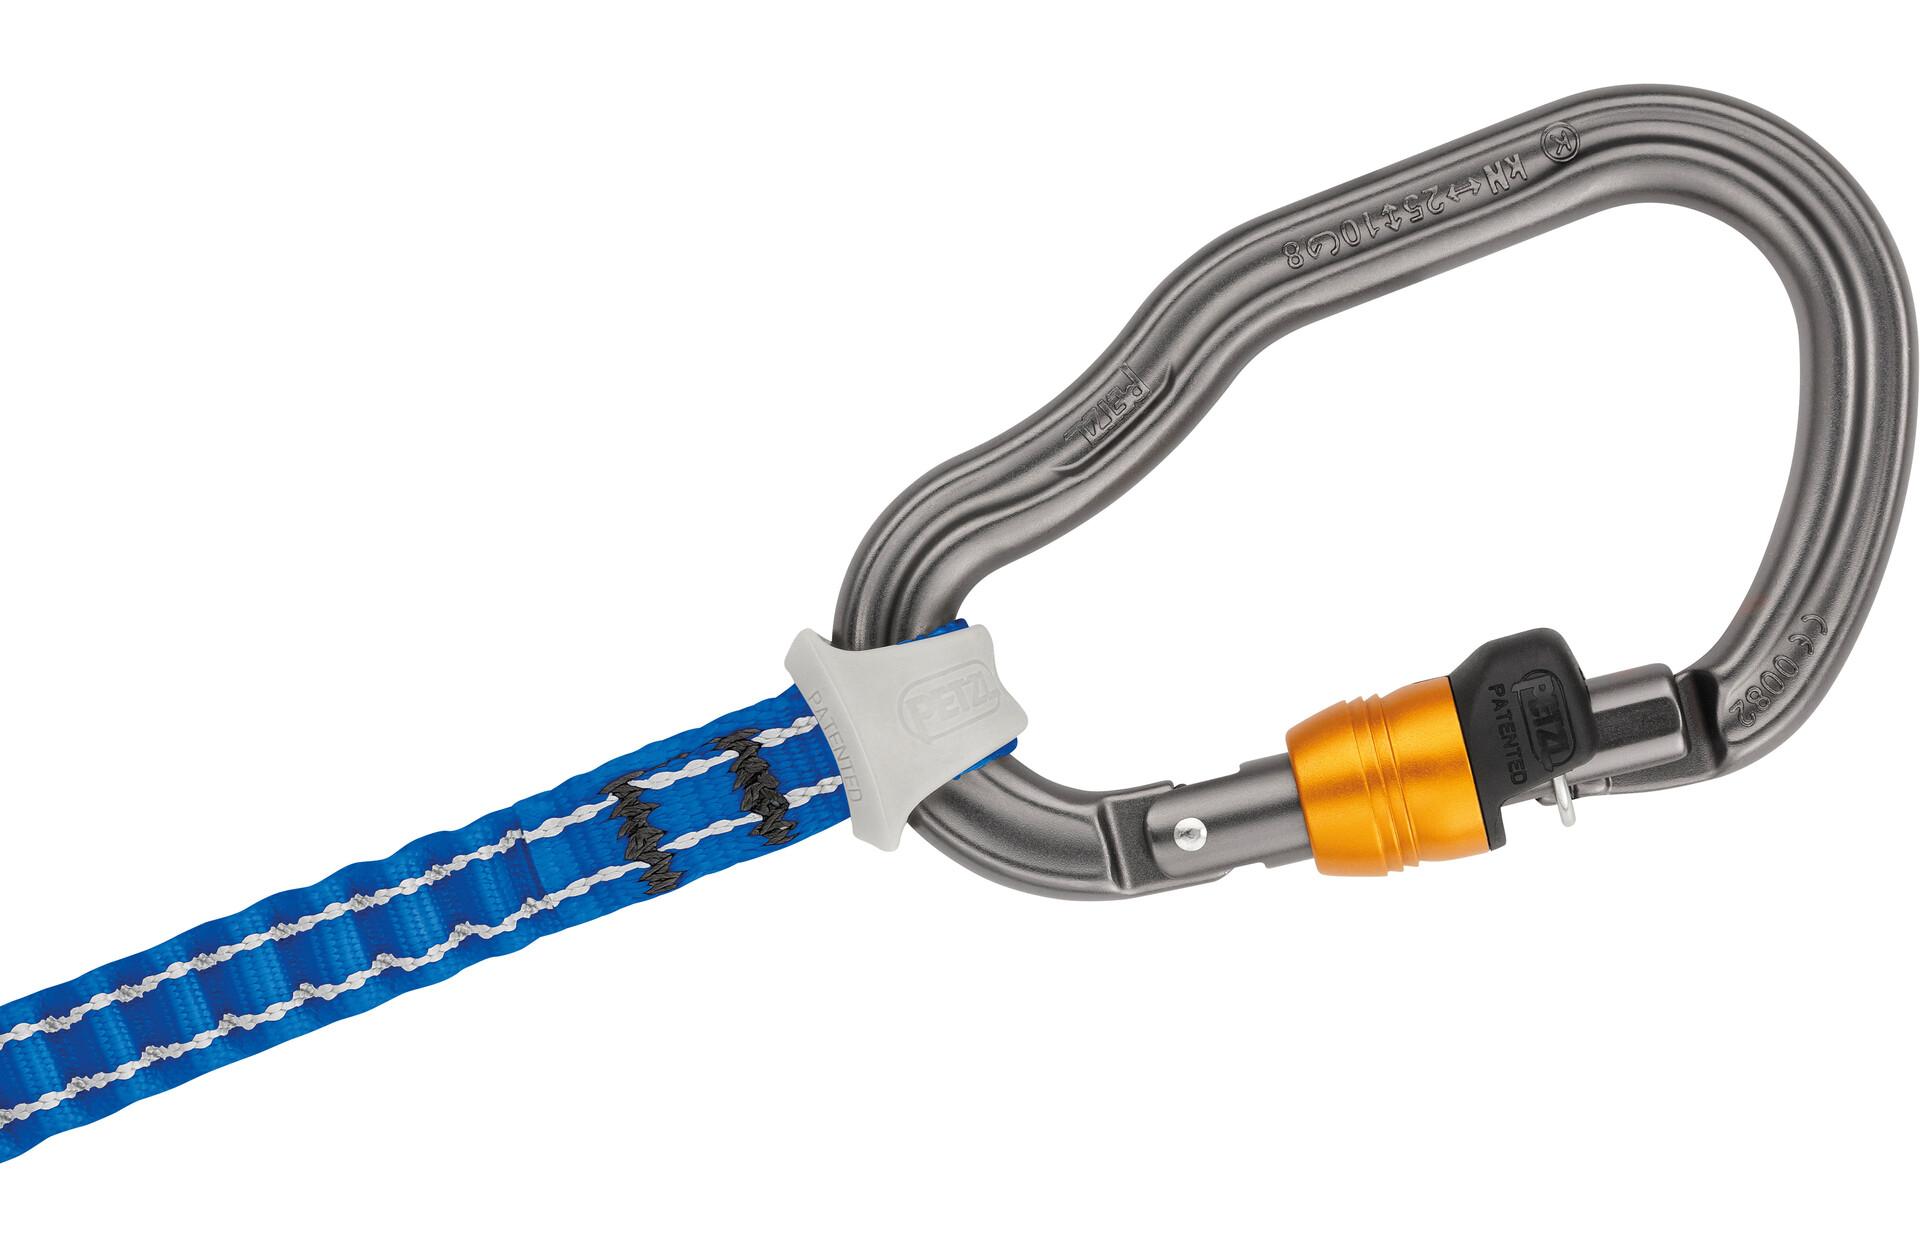 Petzl Klettersteigset : Petzl scorpio vertigo klettersteigset ohne swivel campz